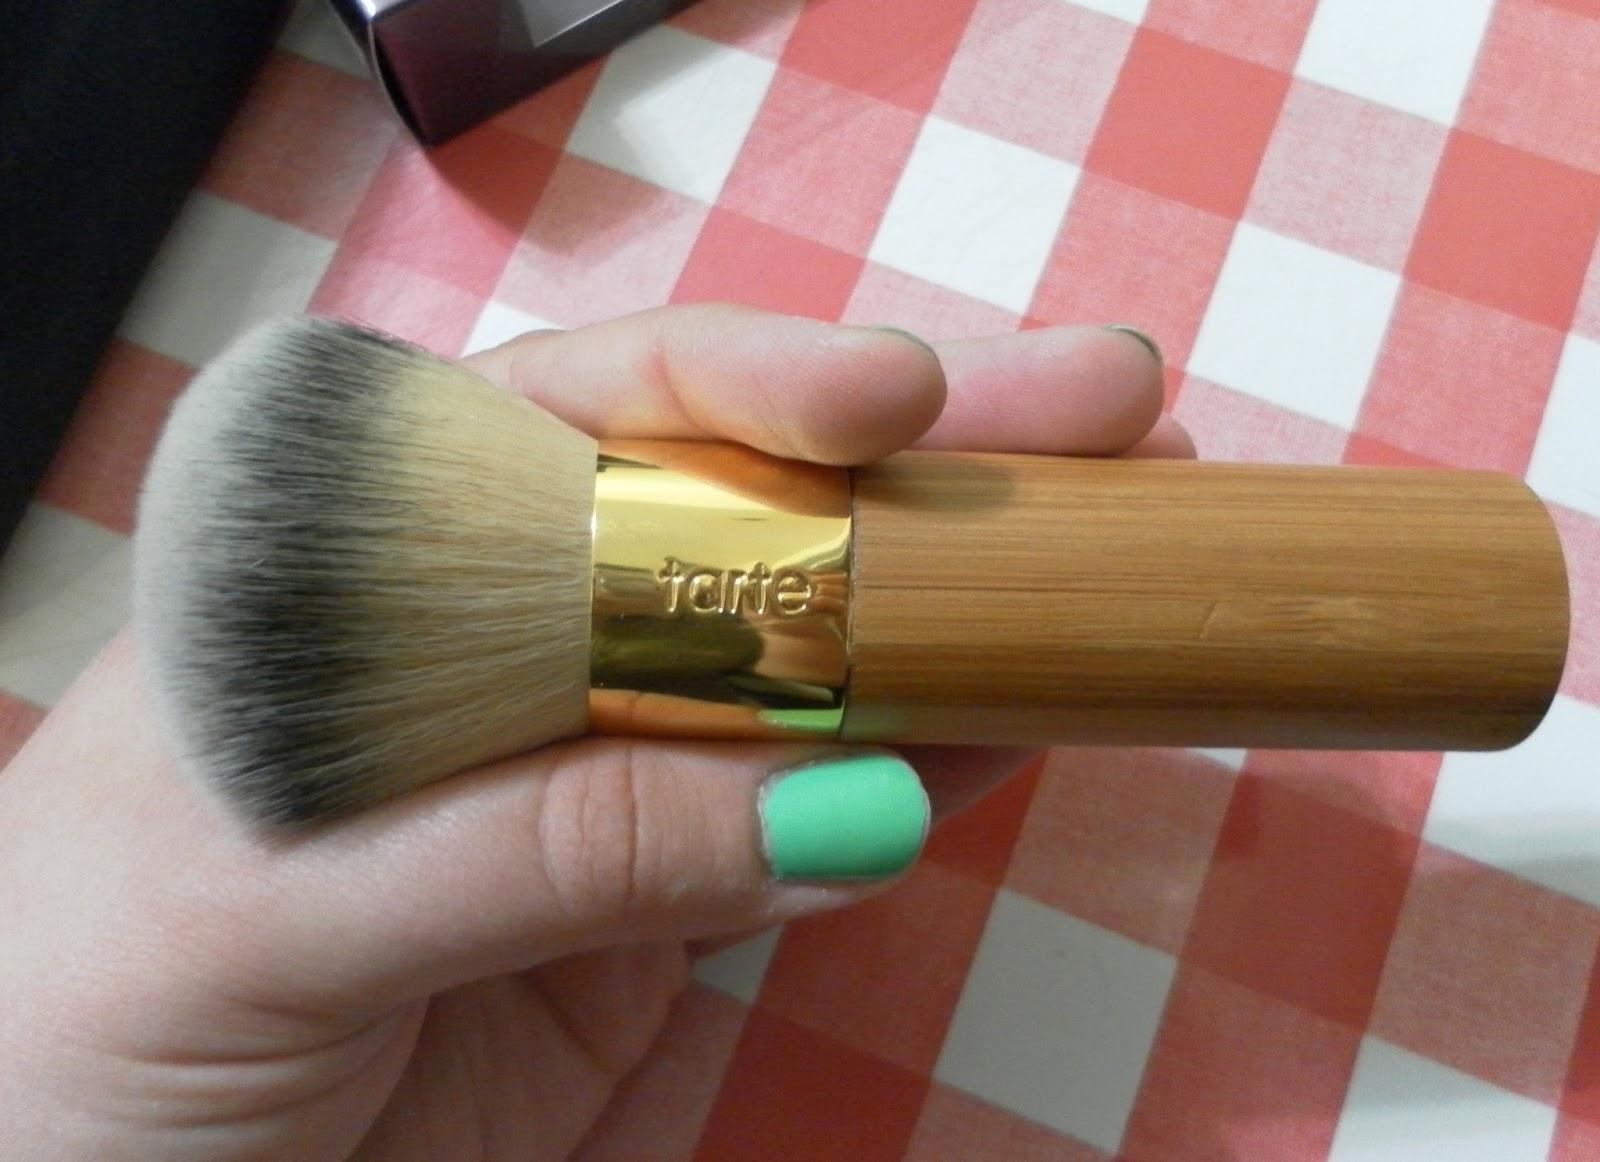 The Buffer Airbrush Finish Bamboo Foundation Brush by Tarte #3